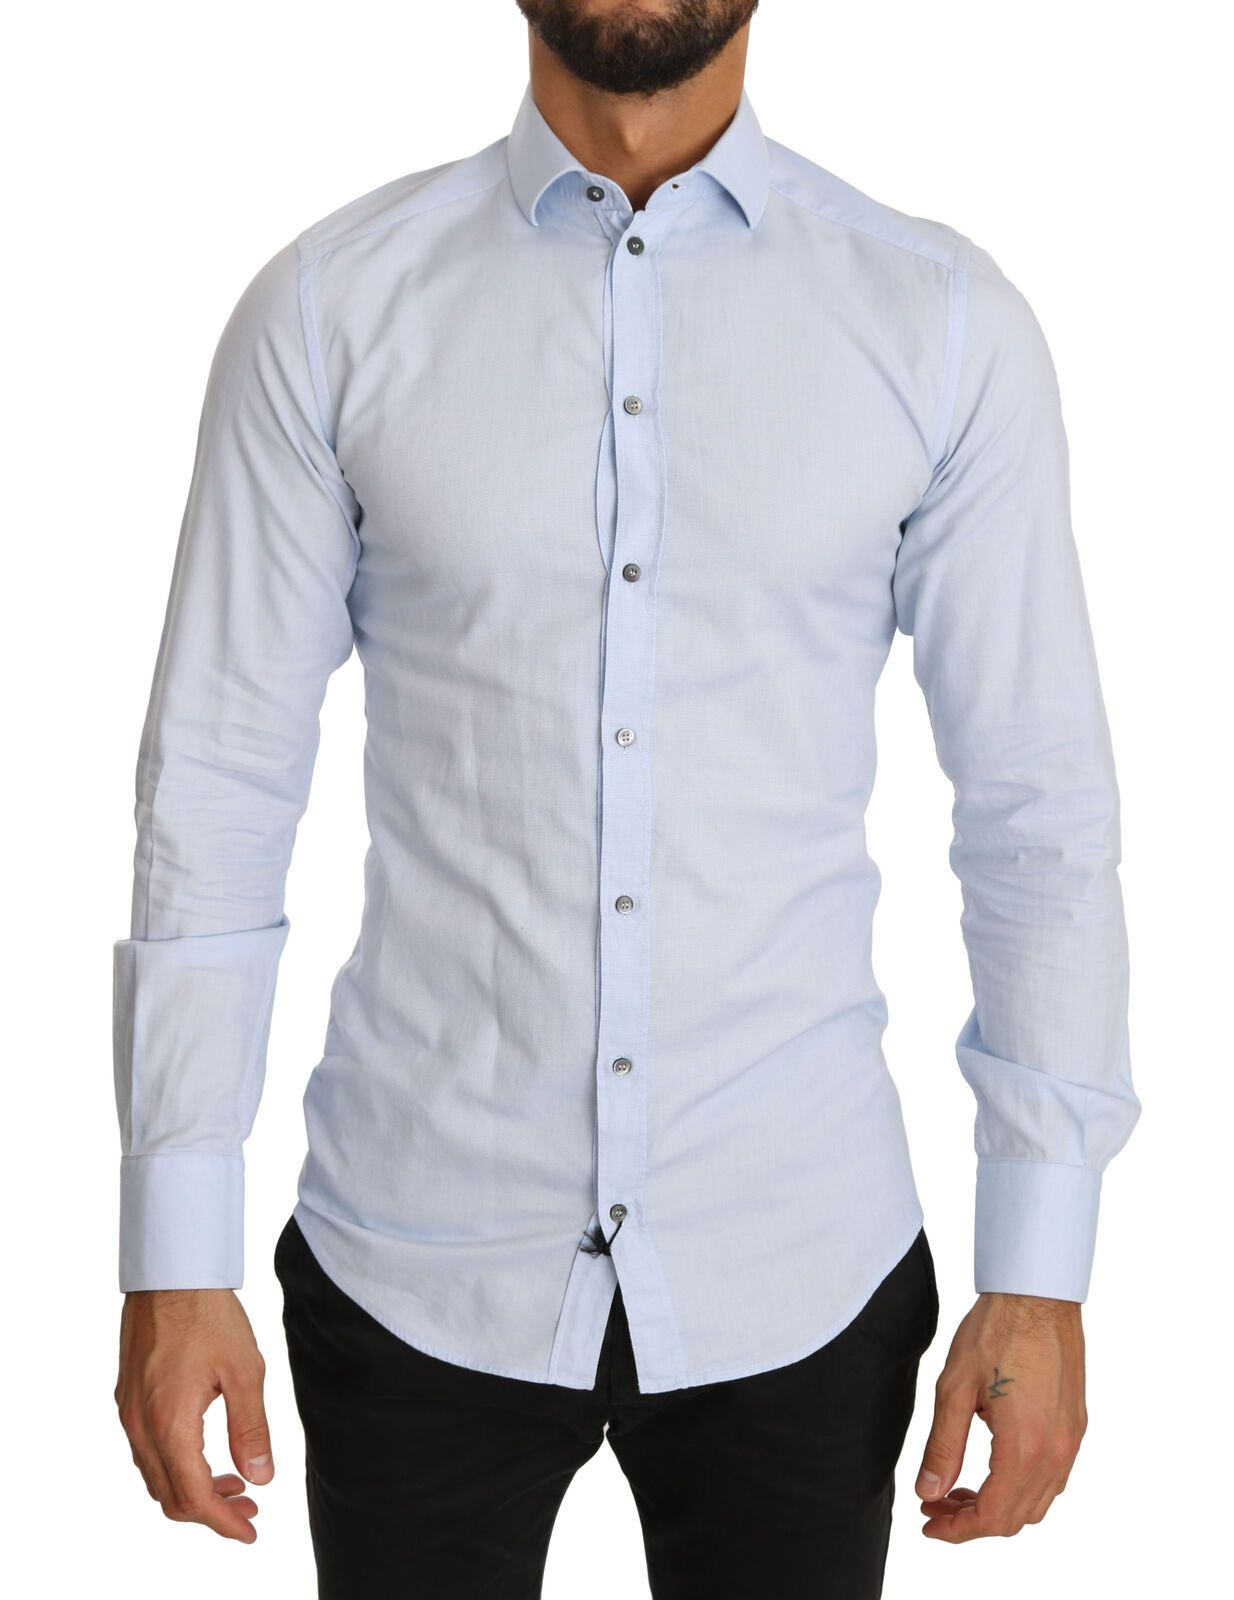 Dolce & Gabbana Men's Formal Dress Cotton Shirt light Blue TSH3900 - IT38   XS